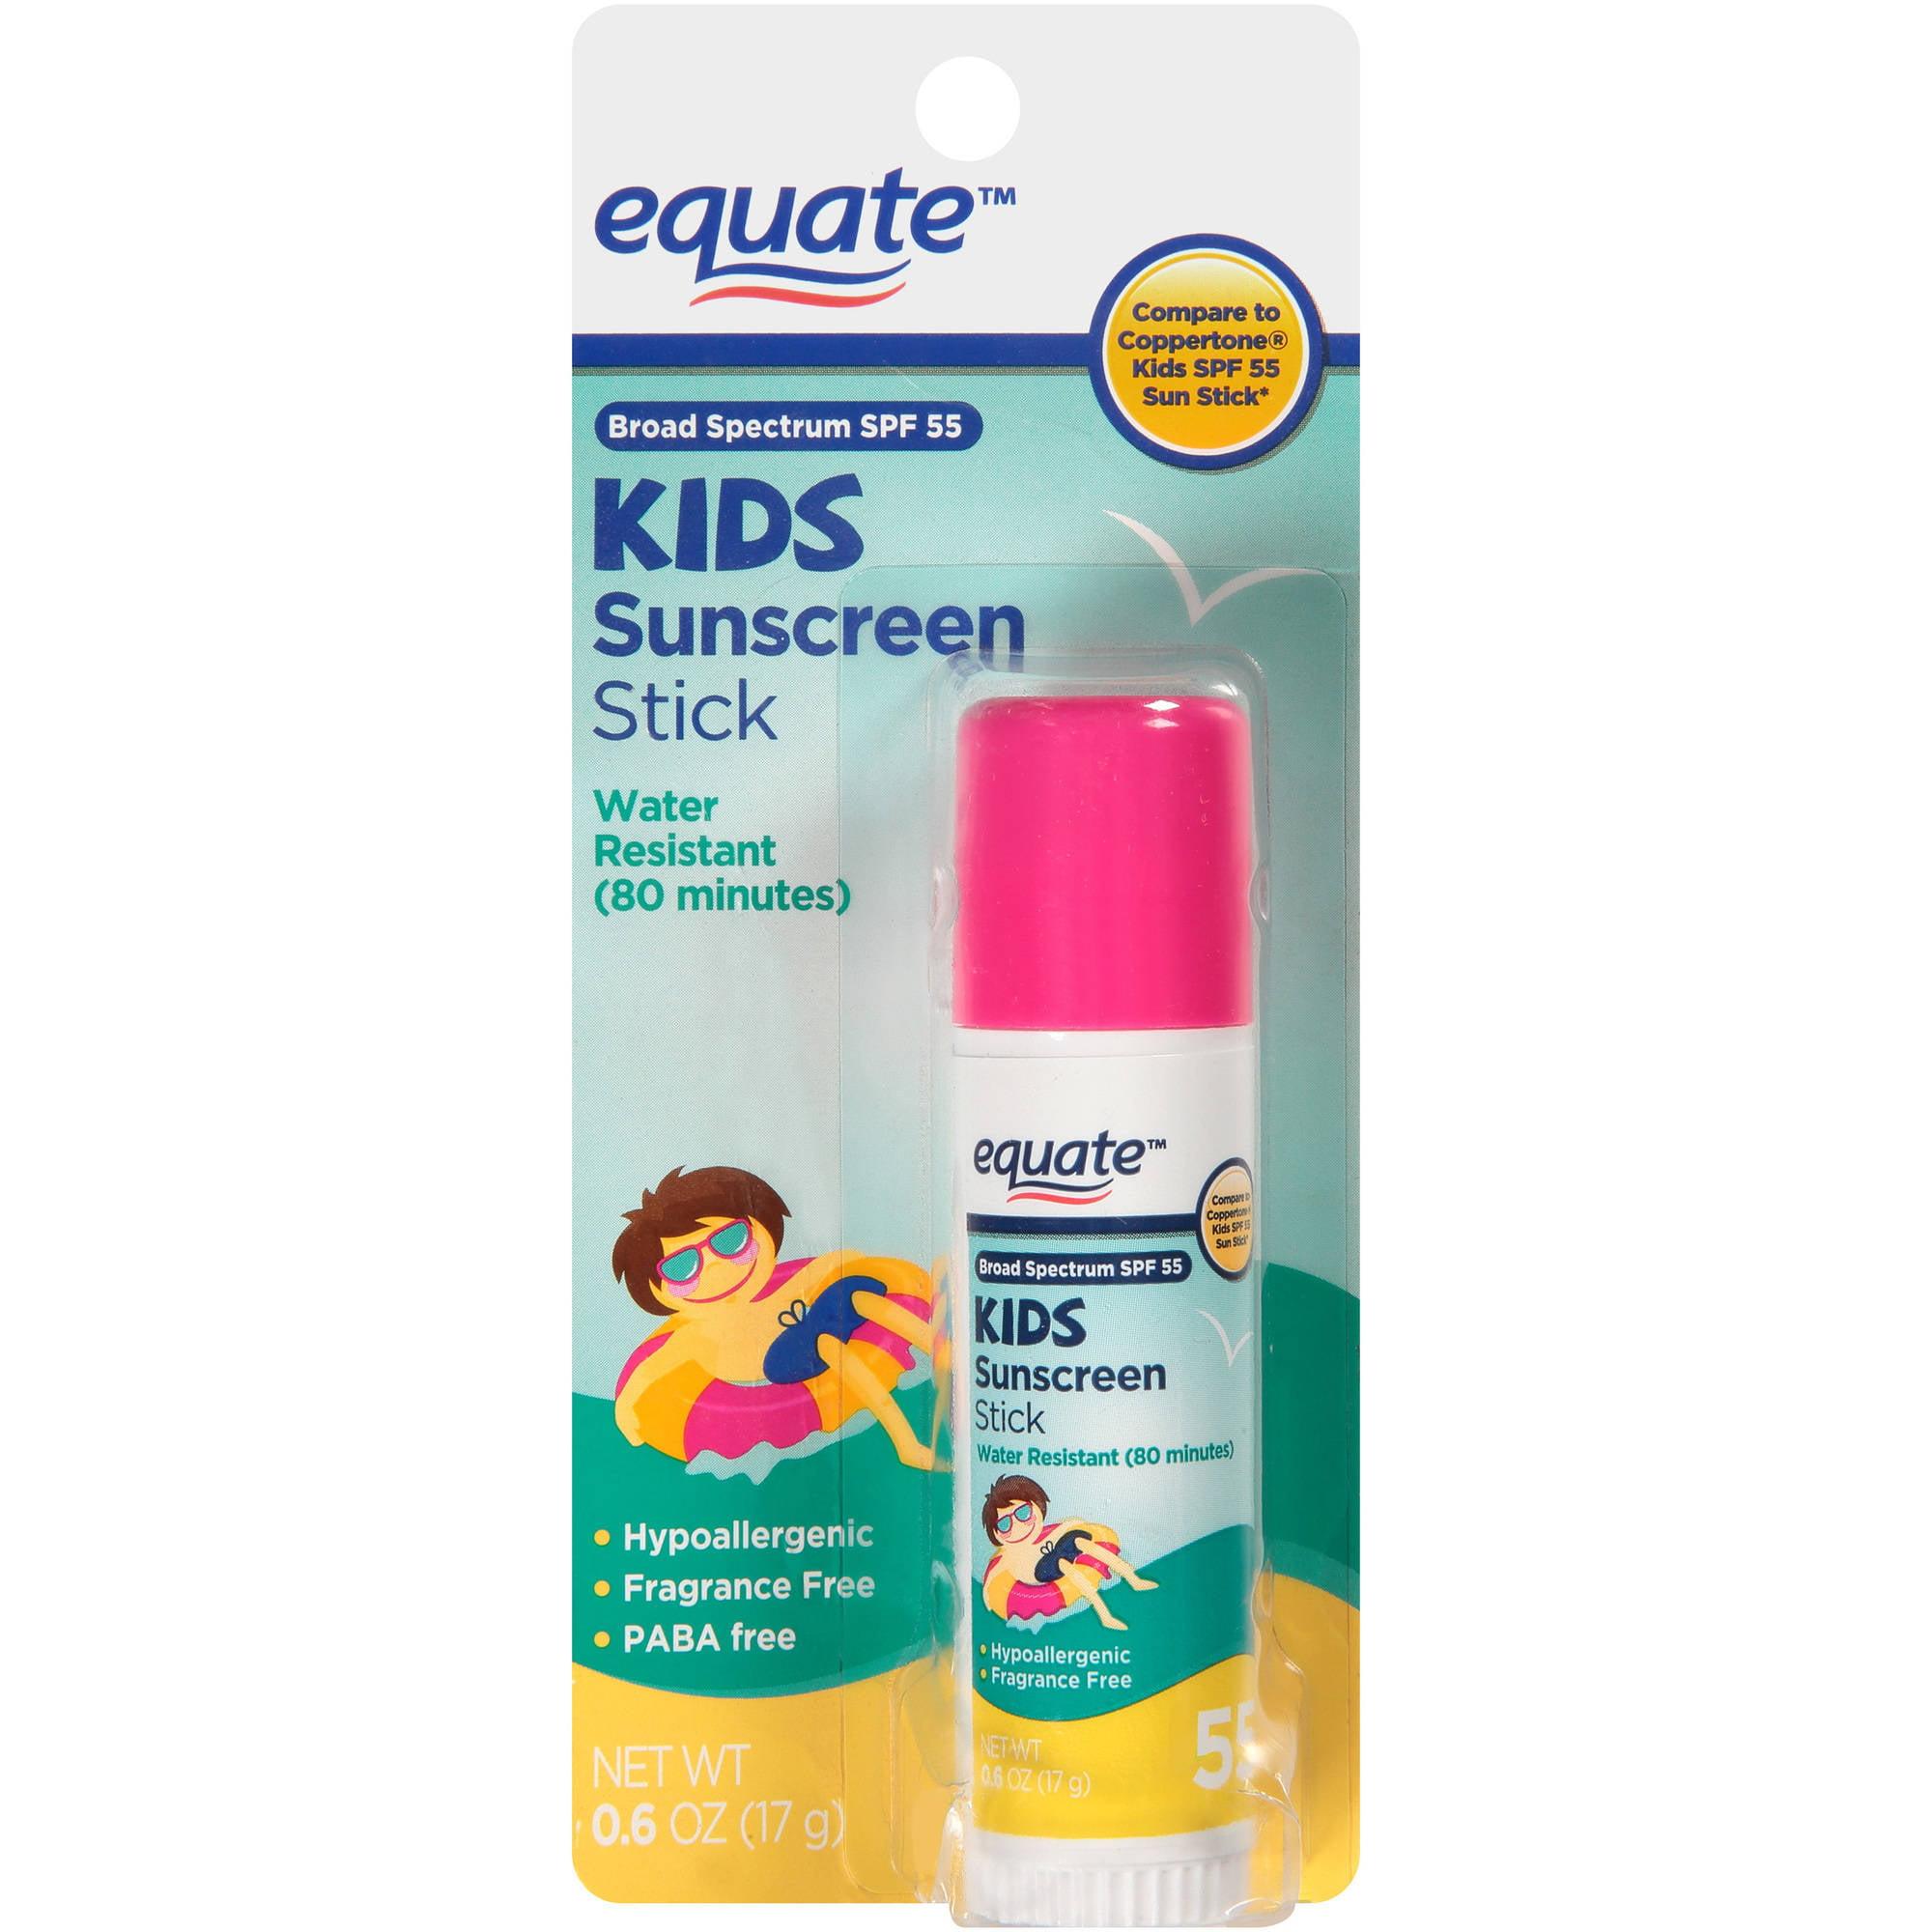 Equate Kids Sunscreen Stick, Broad Spectrum SPF 55, 0.6 oz